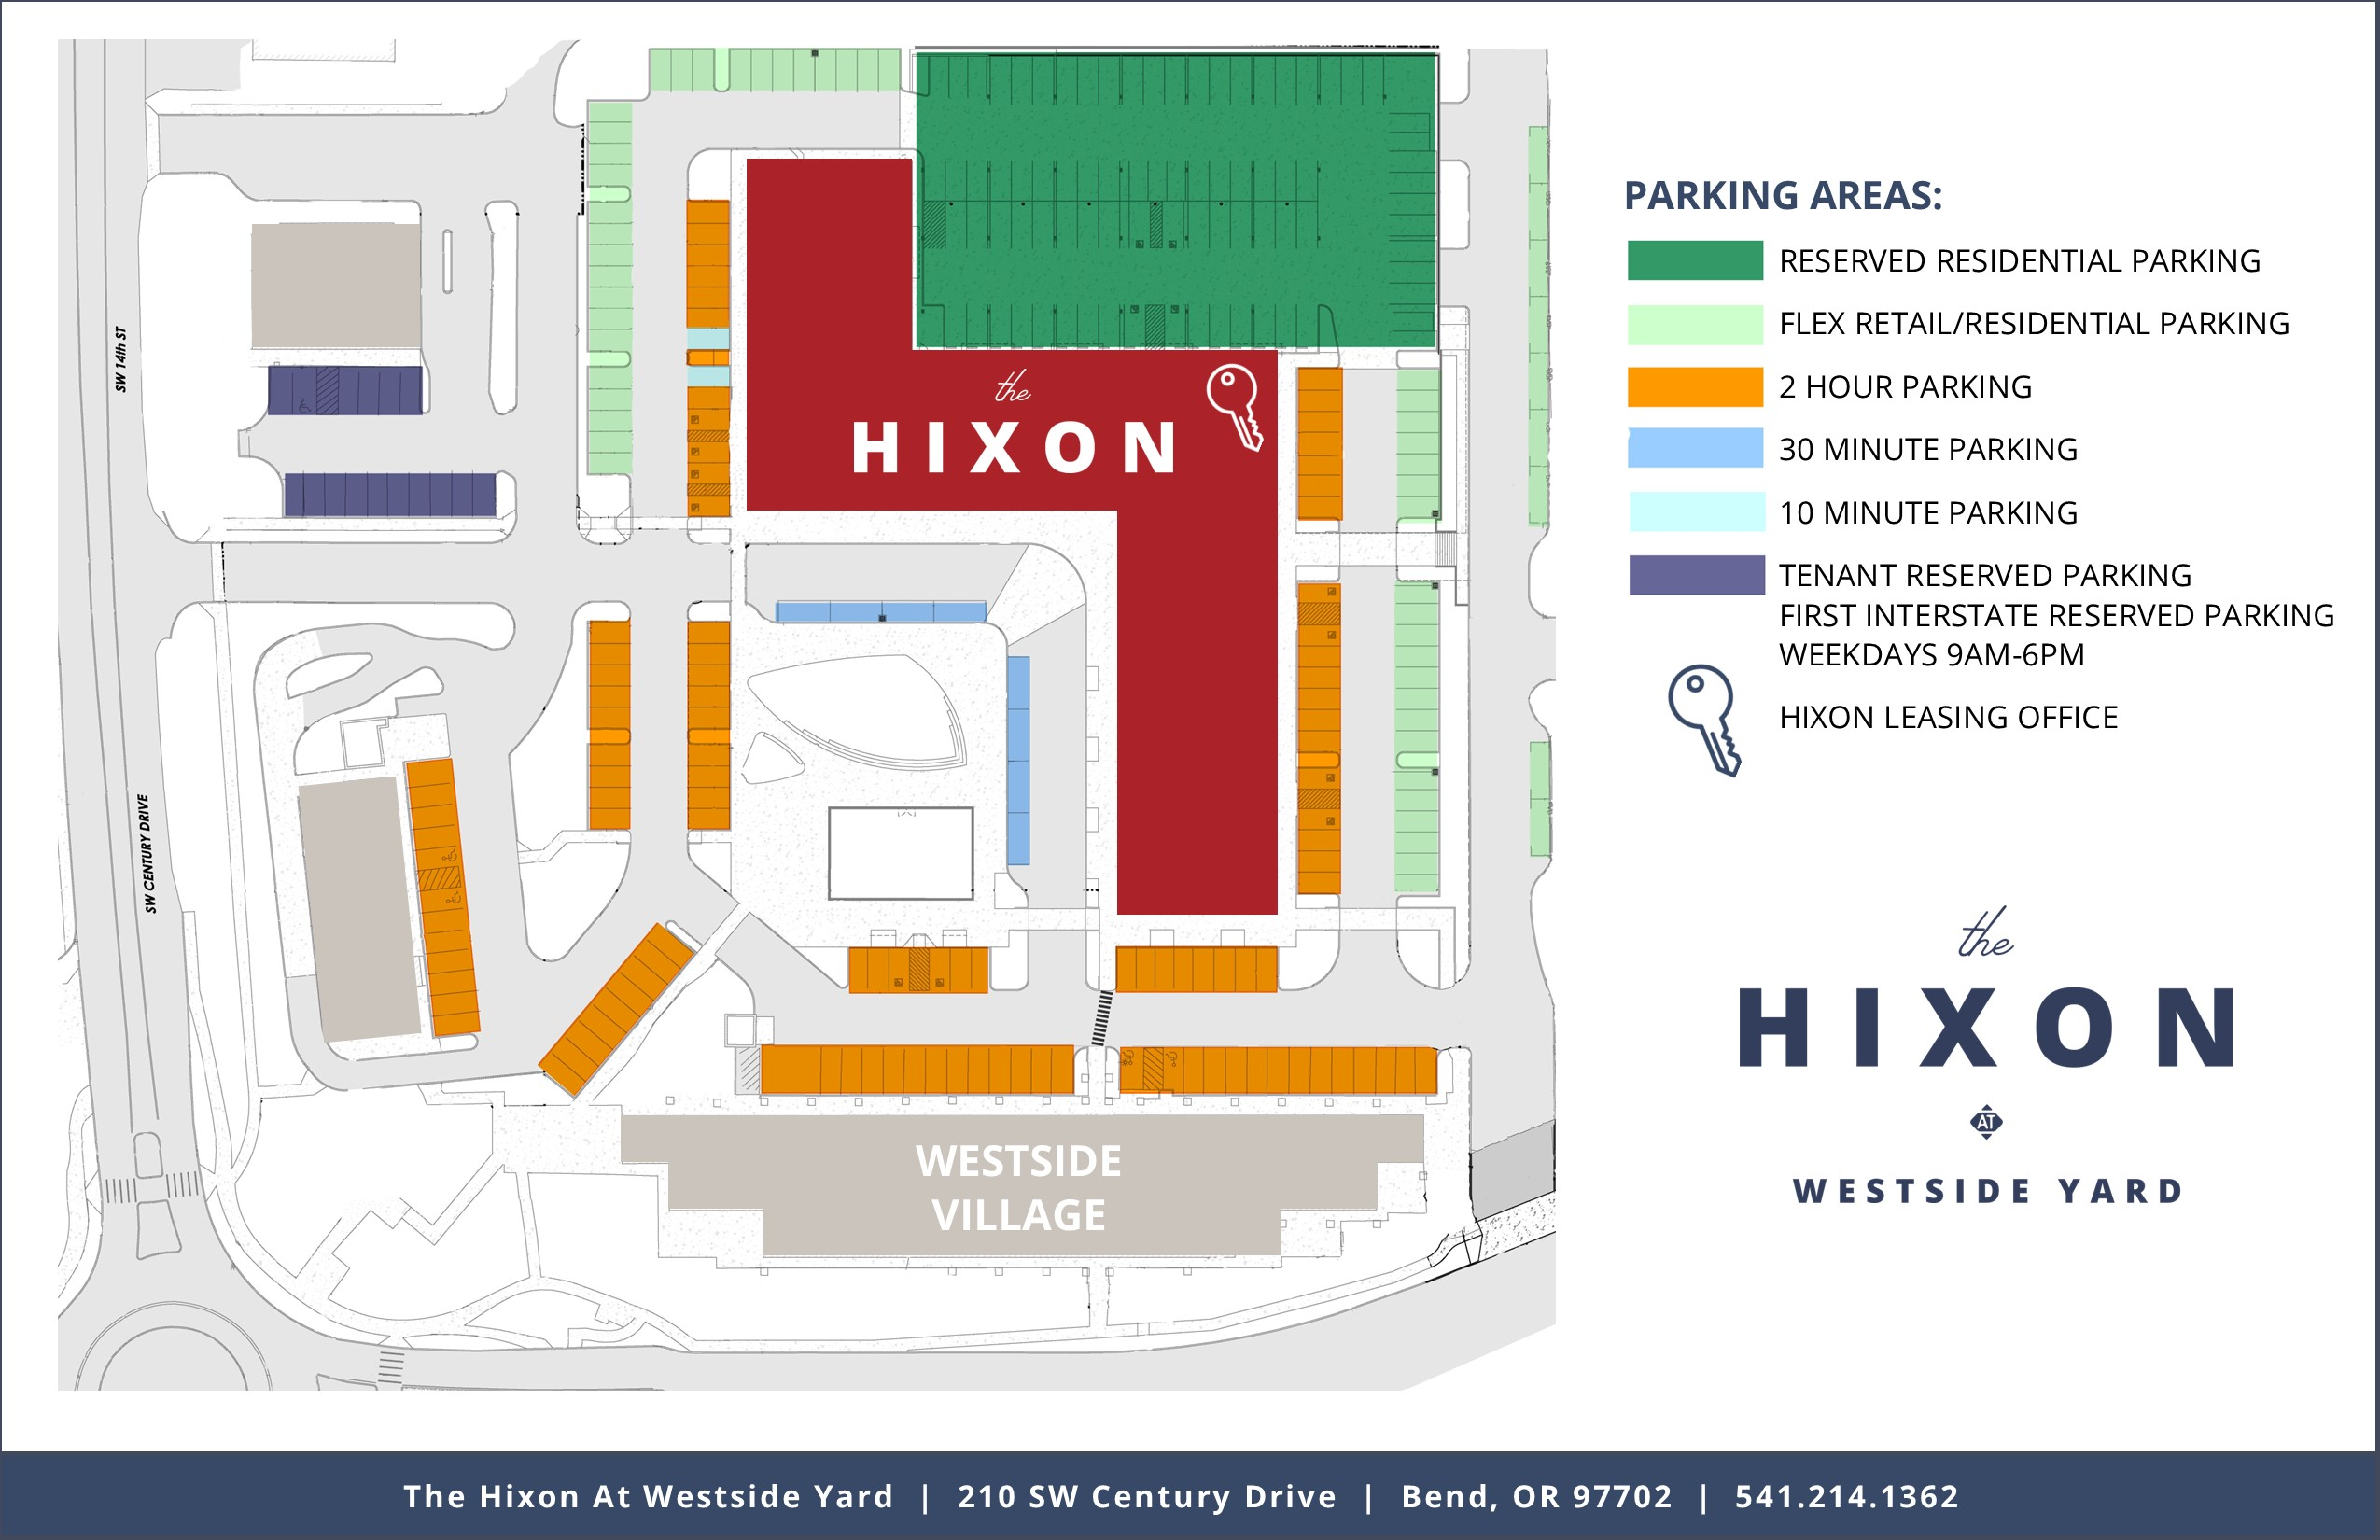 The Hixon Parking Map